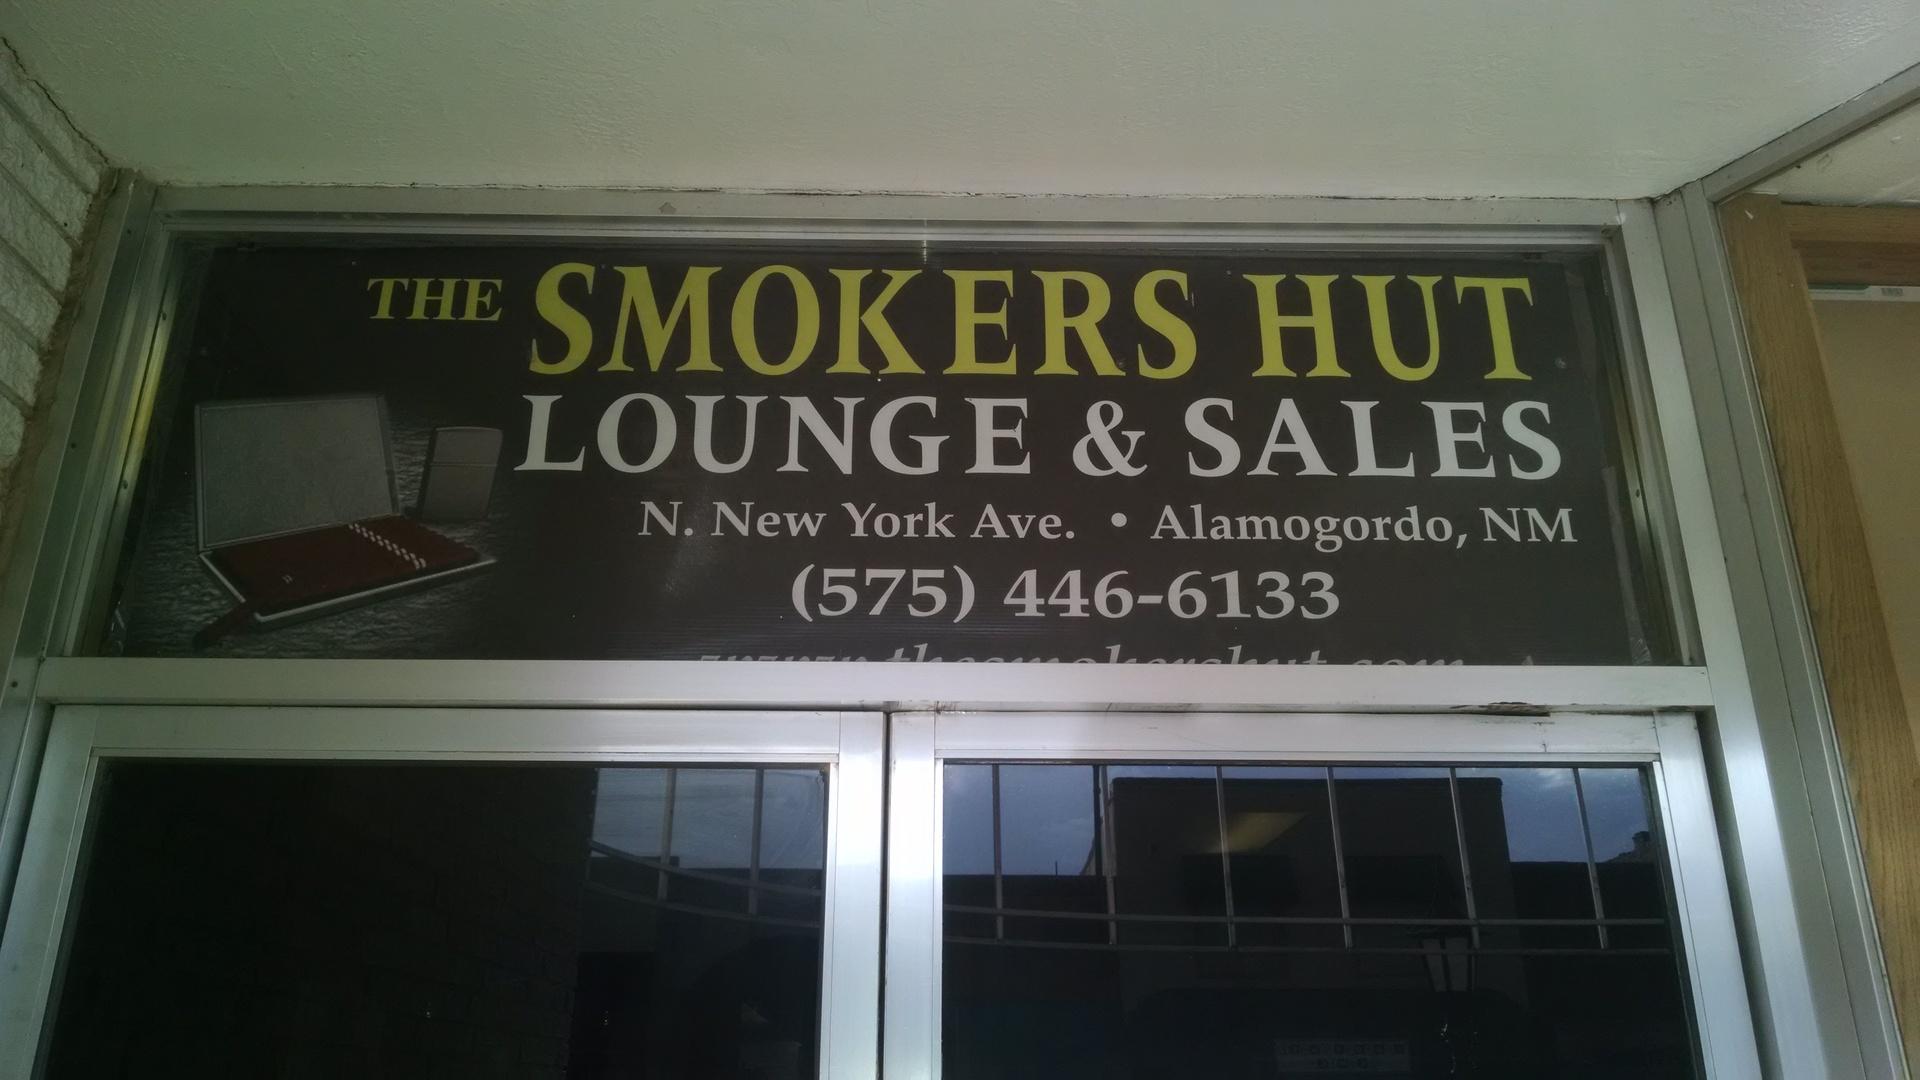 The Smoker's Hut, 910 N. New York Ave., Alamogordo, New Mexico, 88310, USA